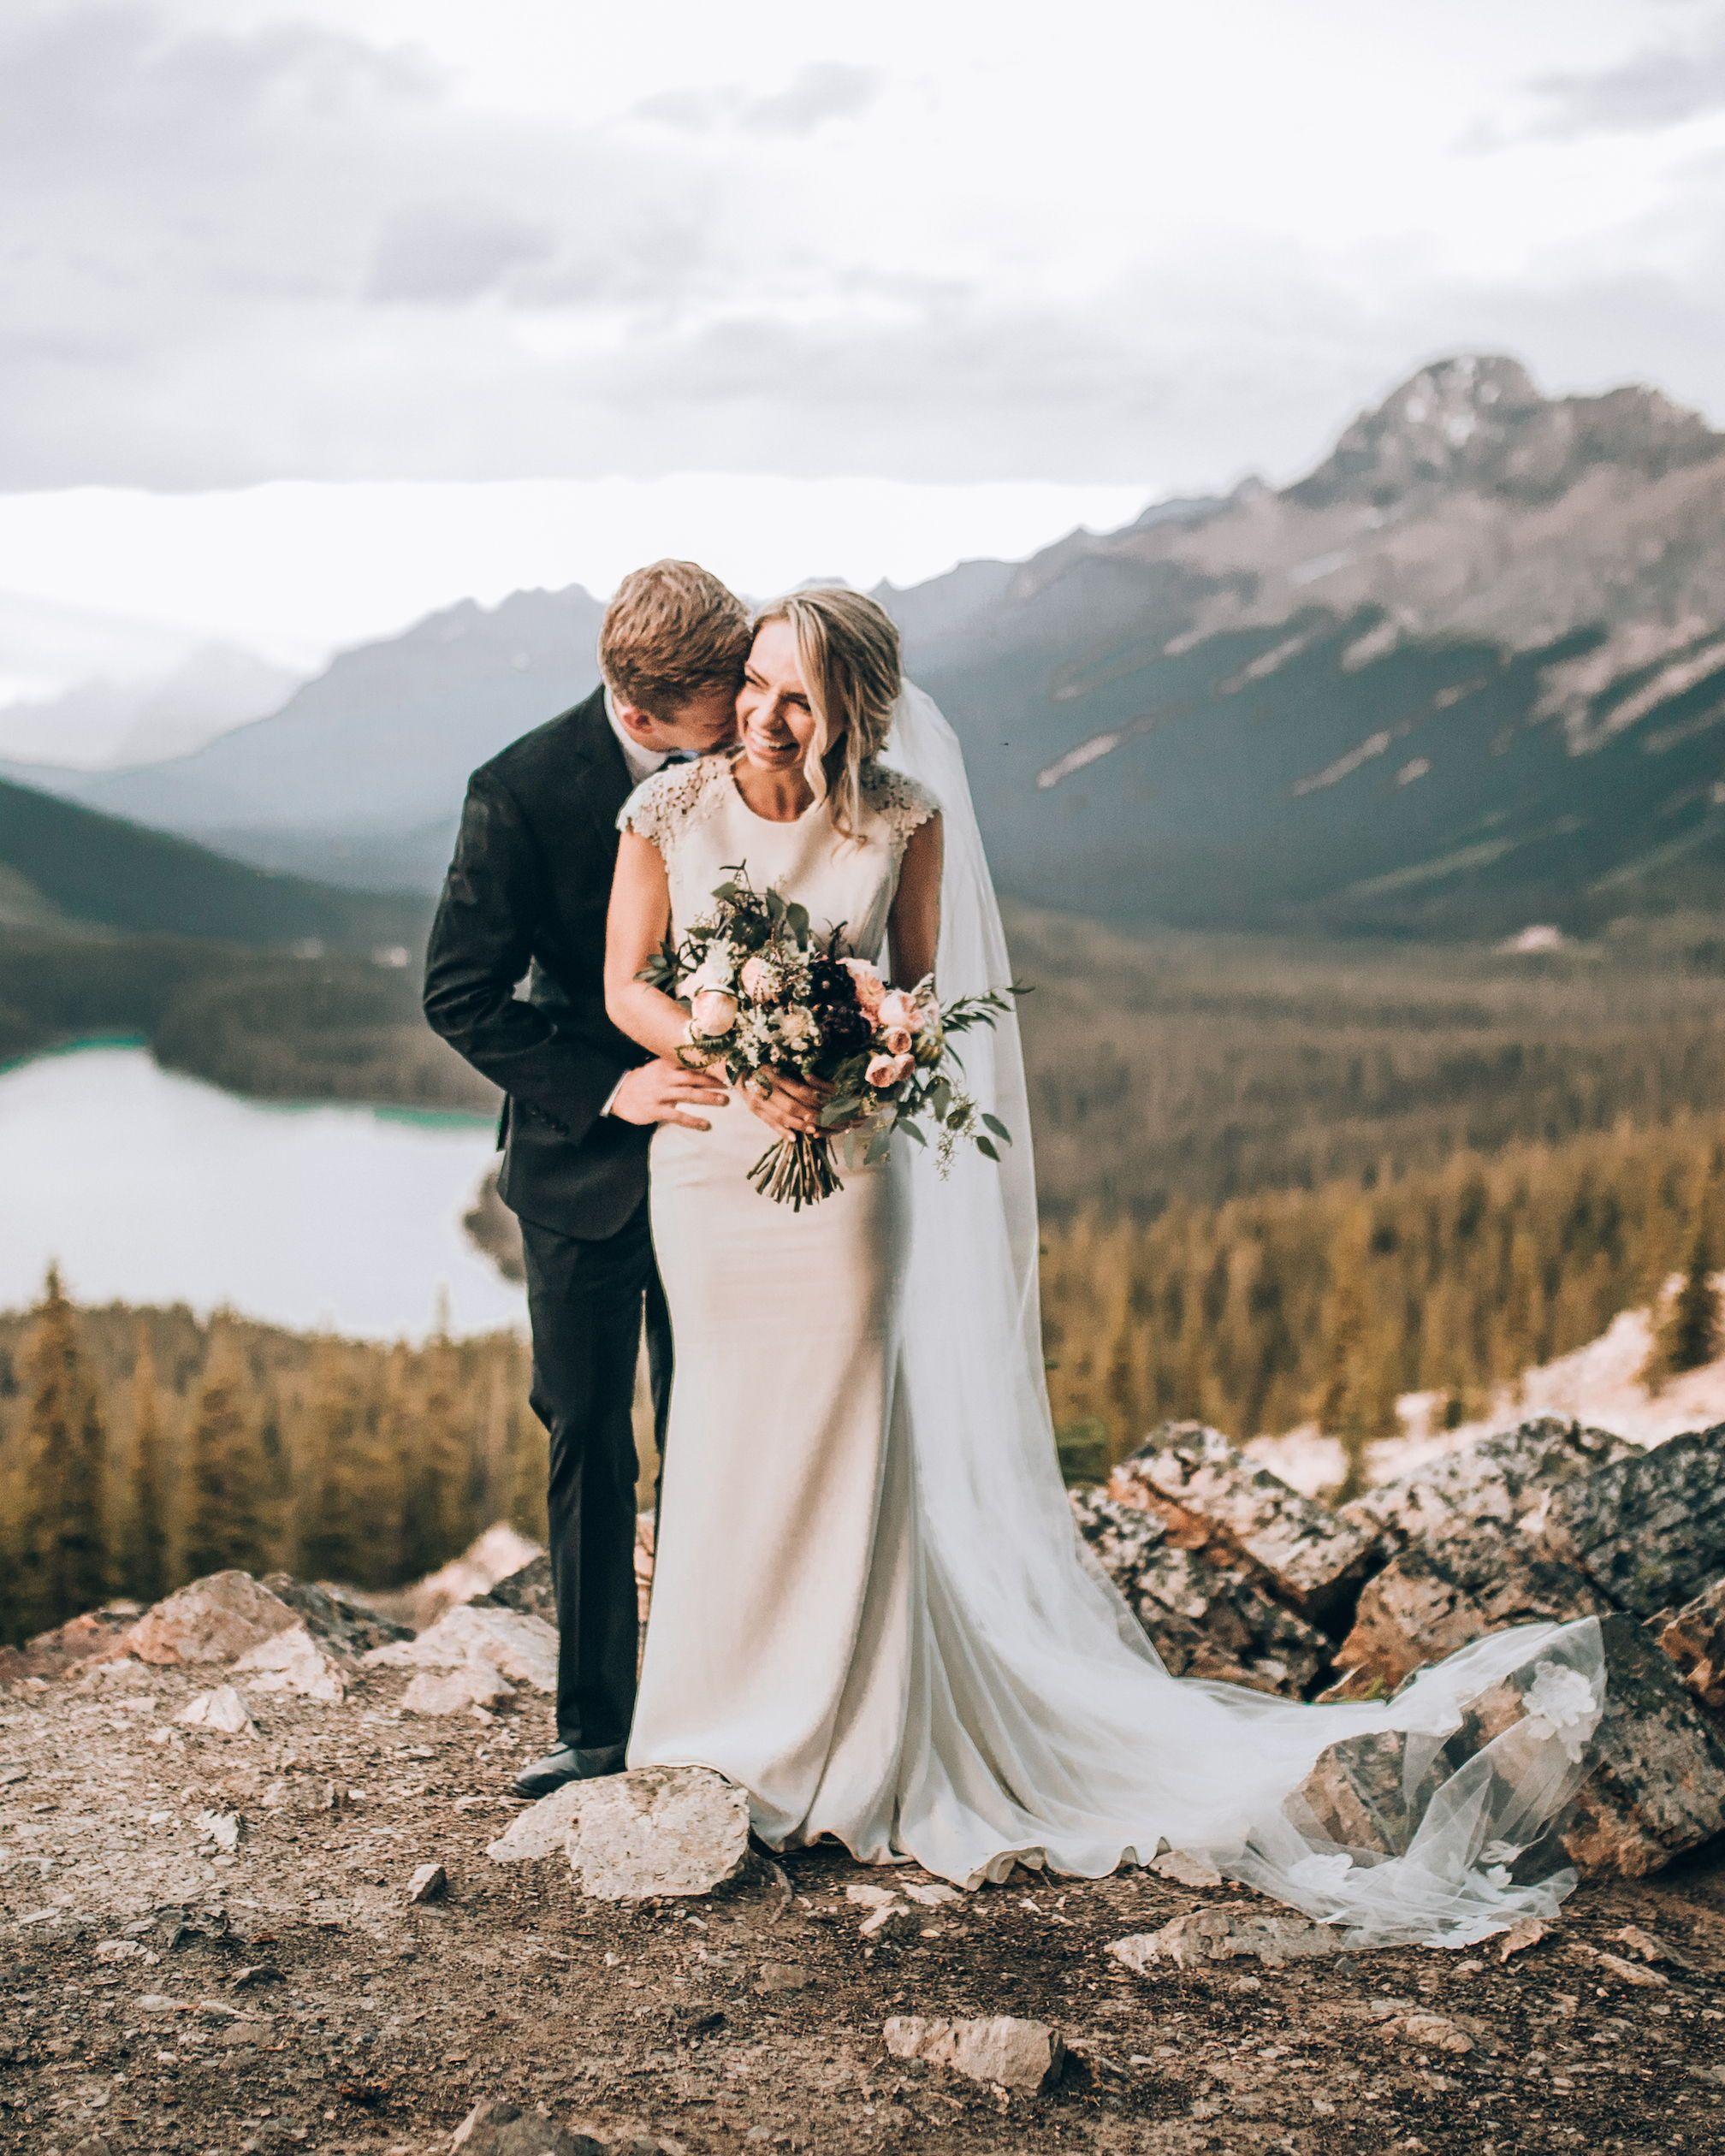 Real Bride Kaestle In A Custom Mikaella Gown. Photo: Duke